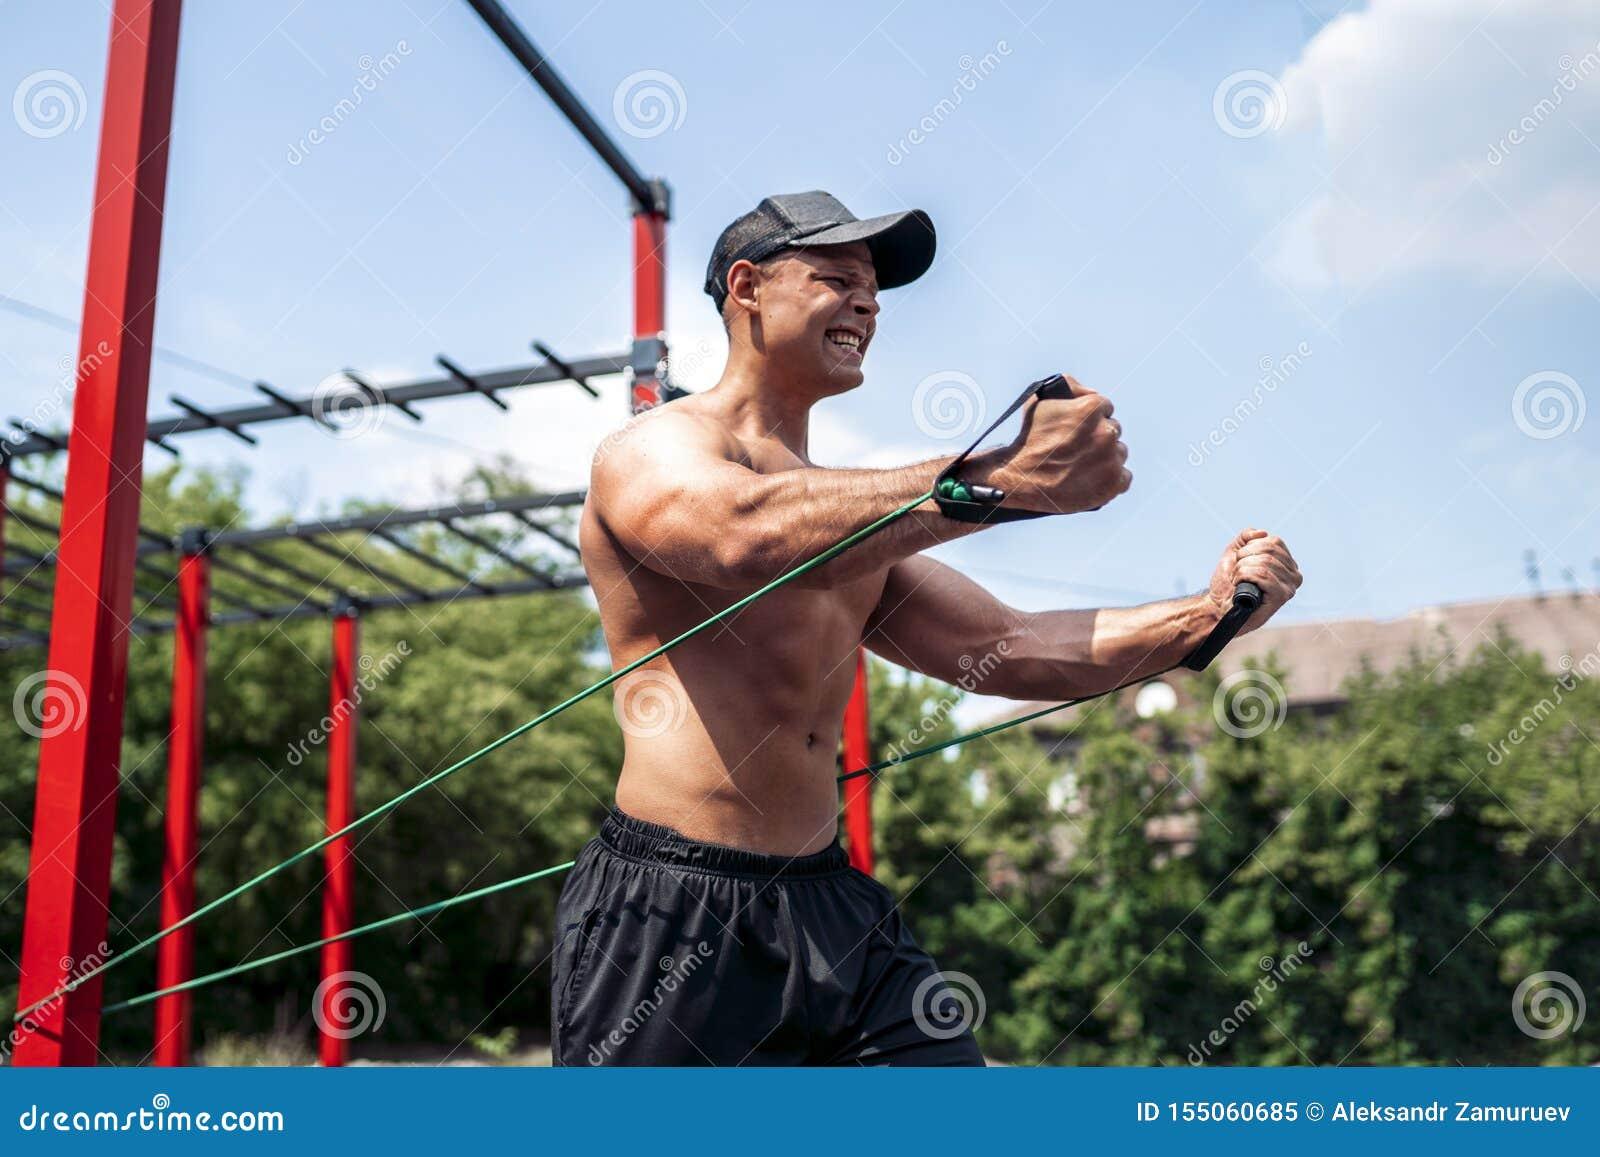 Winning Cheering Success Fitness Man In New York Stock